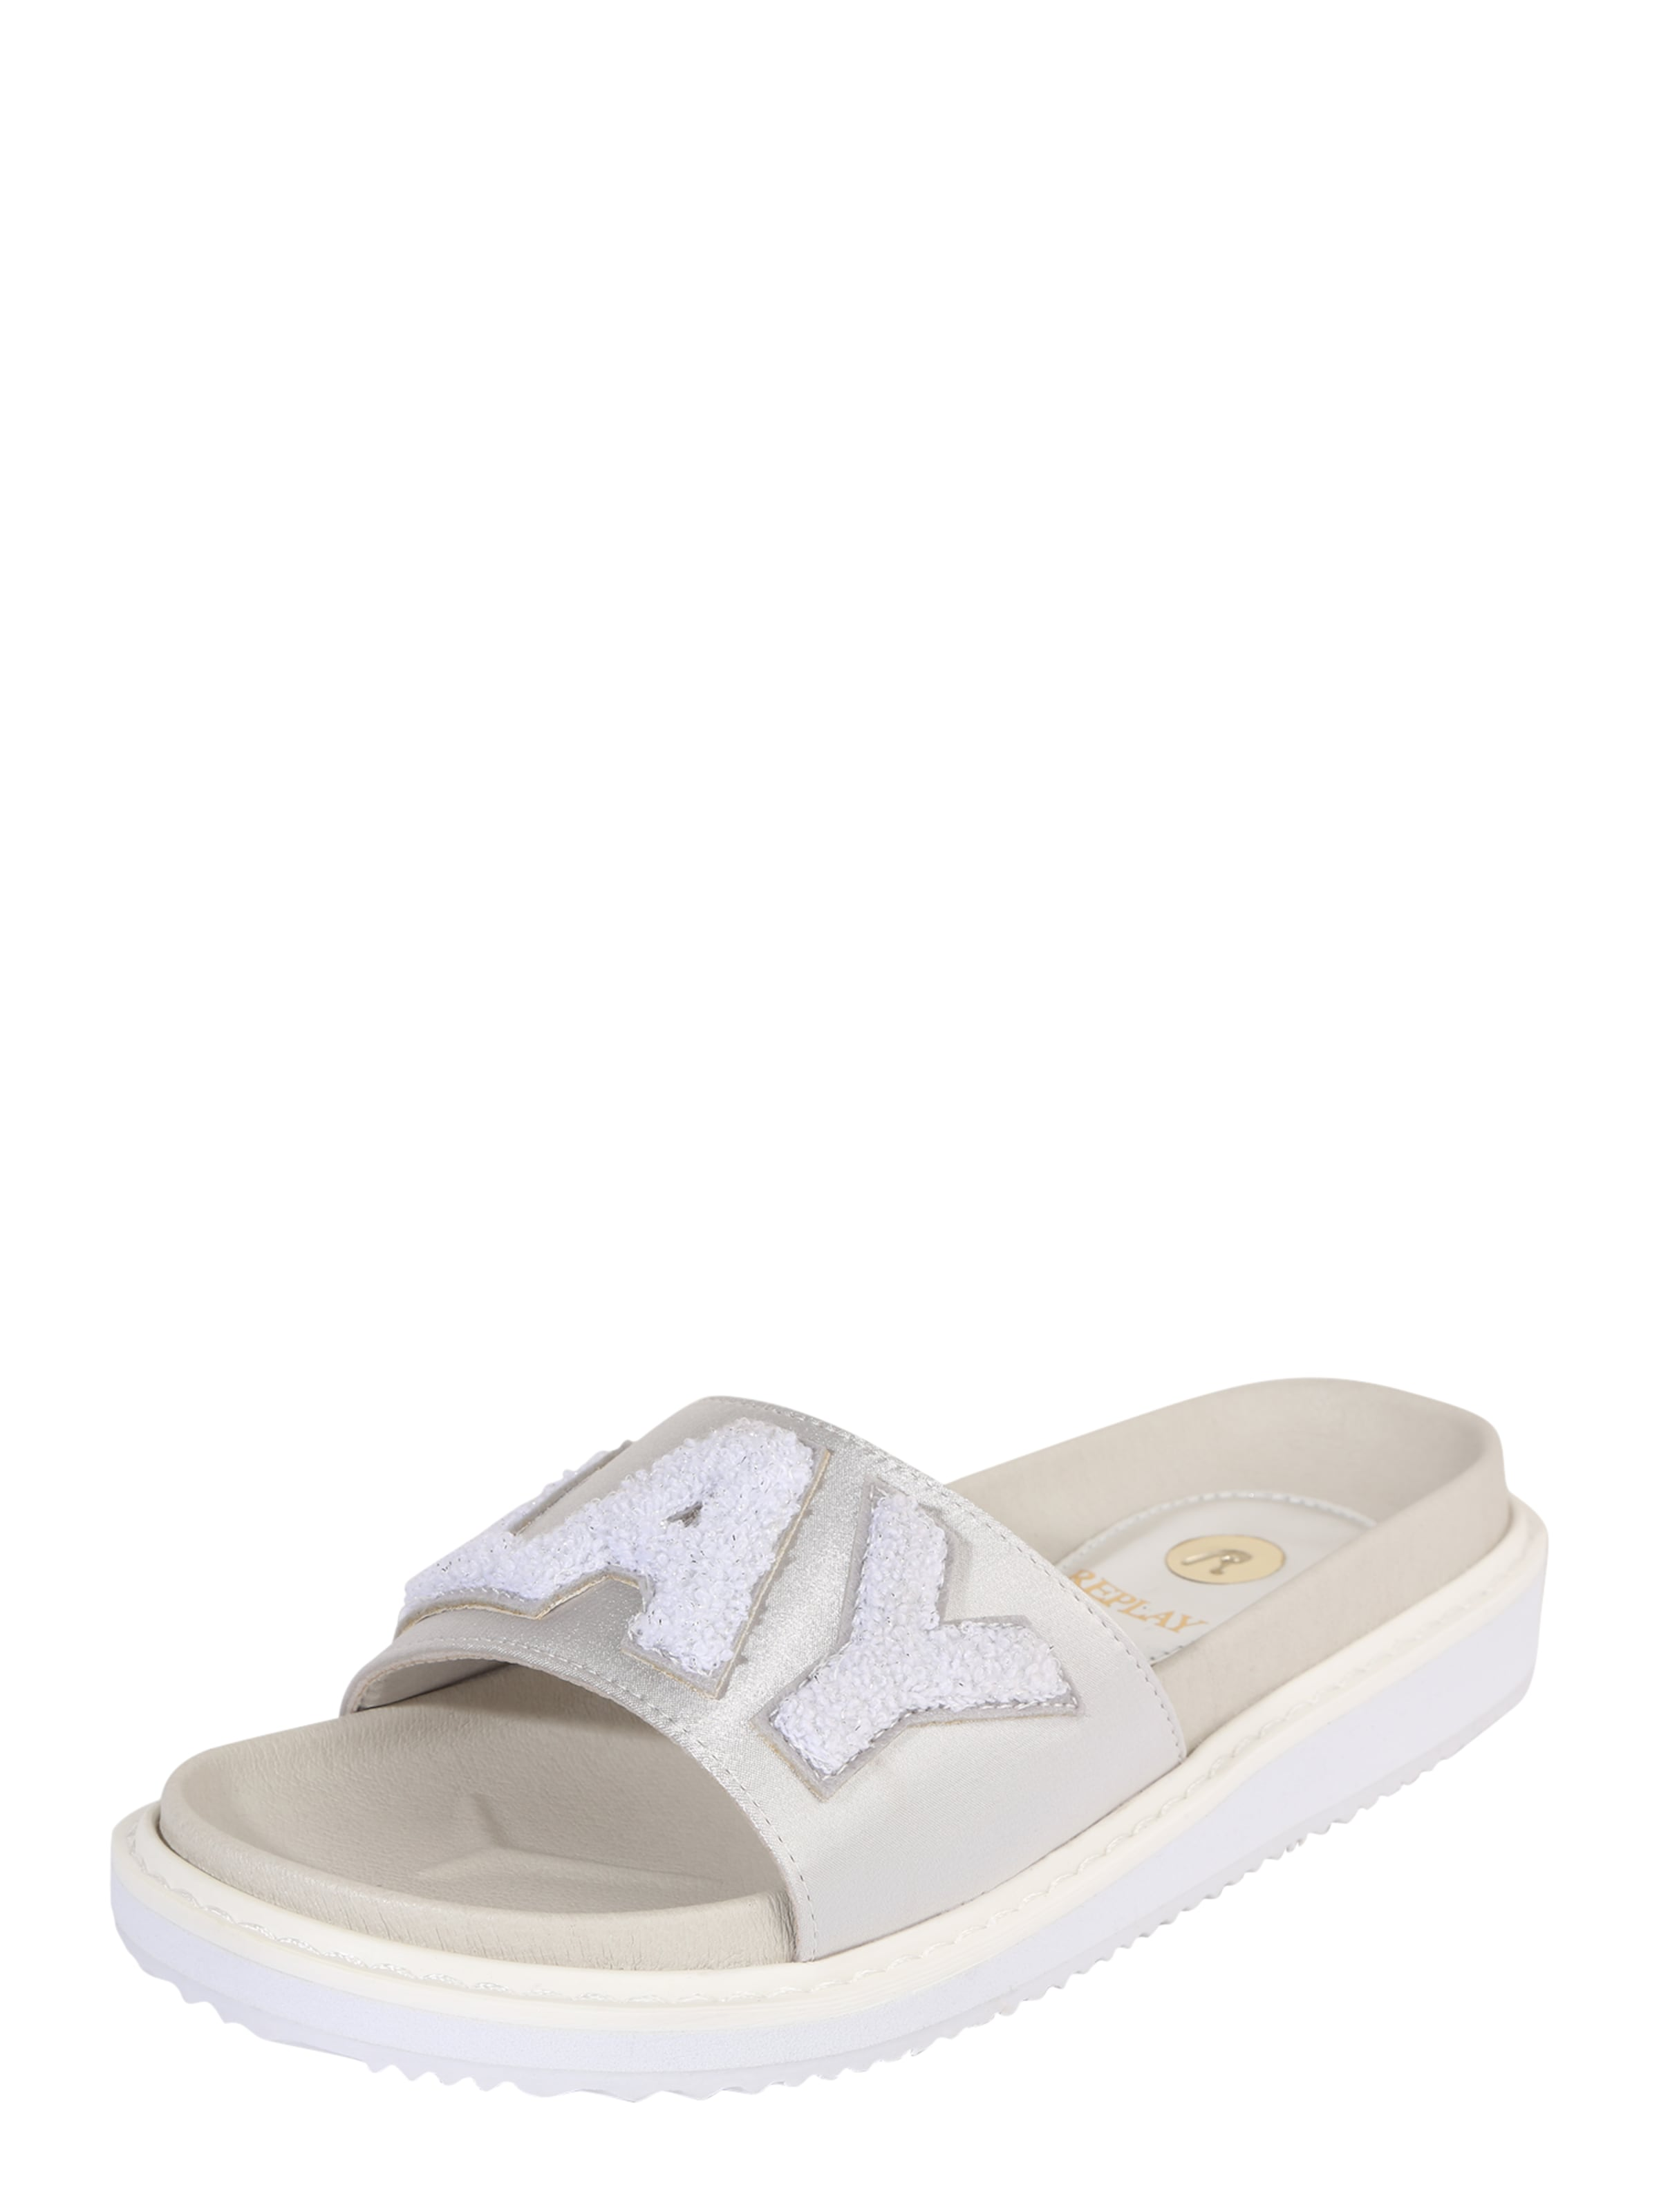 Haltbare Mode billige Schuhe REPLAY | Pantolette 'KNACK' Schuhe Gut getragene Schuhe